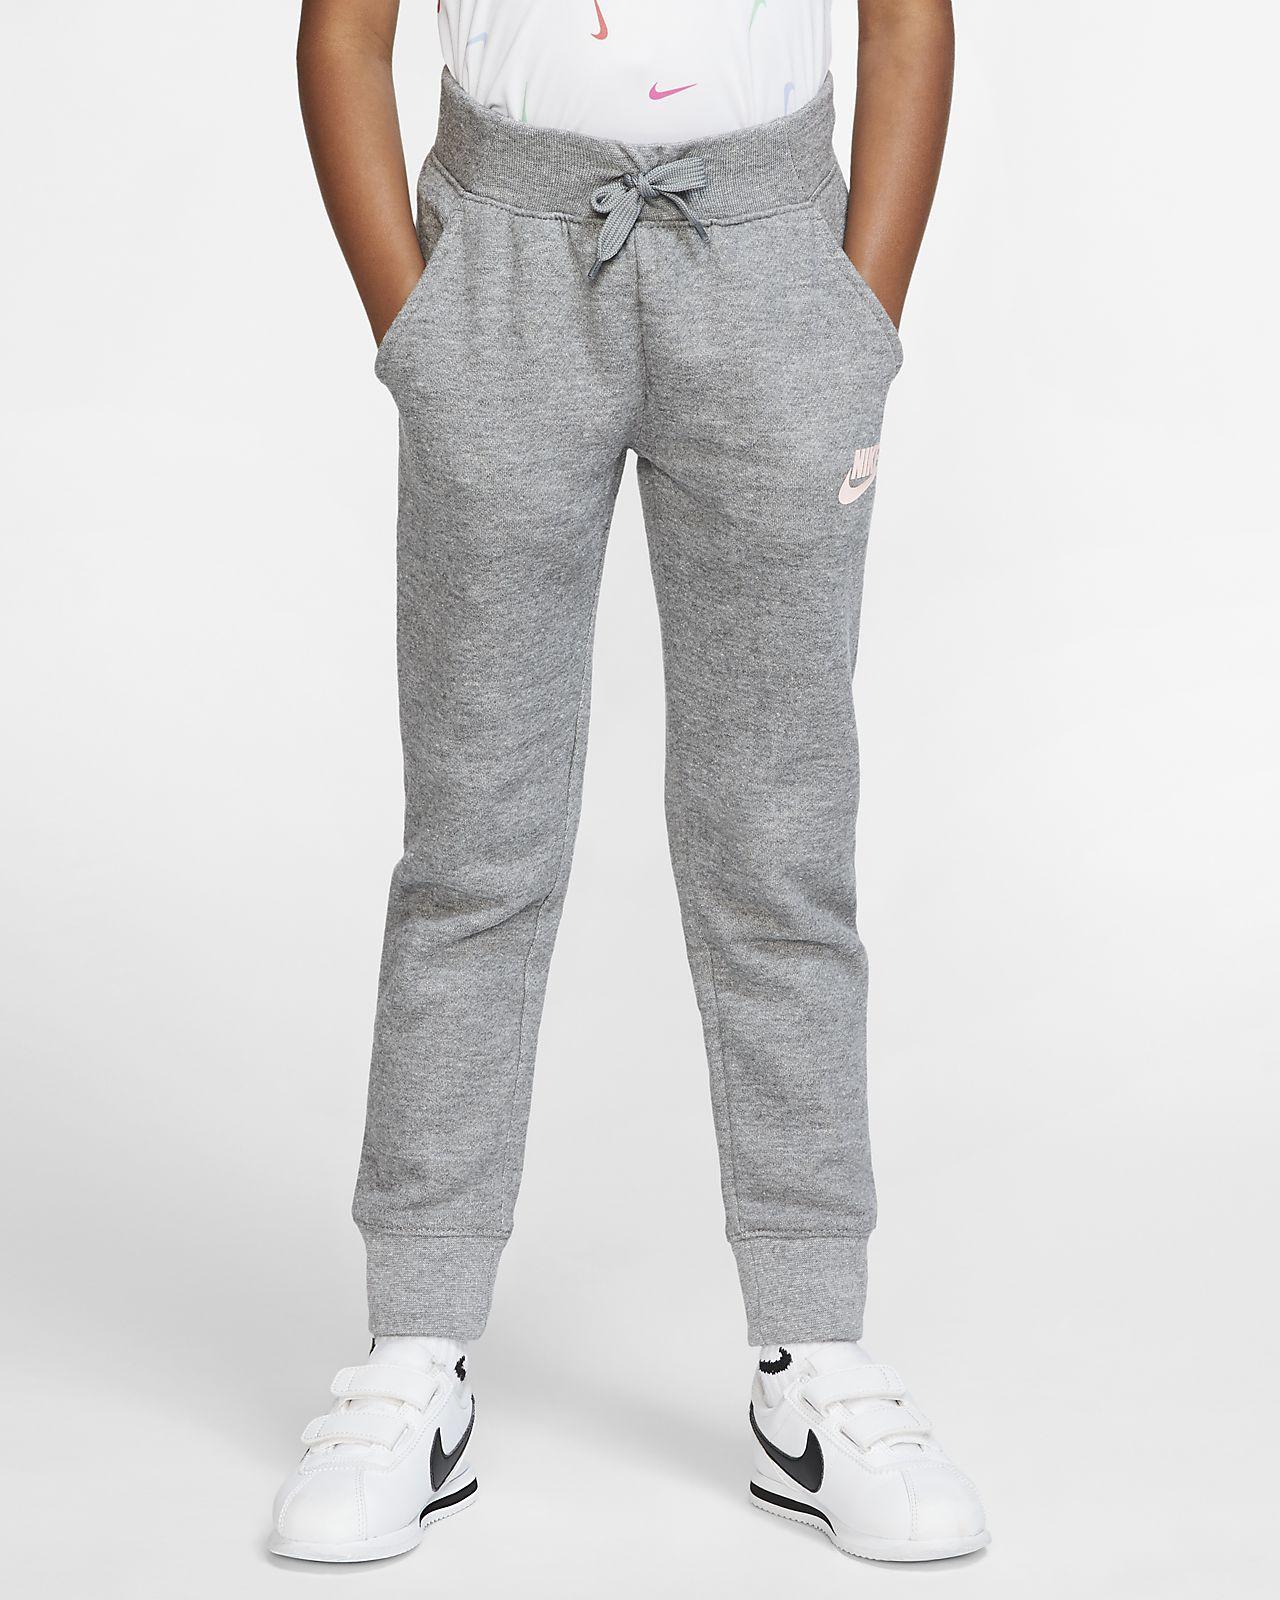 Pantalon de jogging en tissu Fleece Nike Sportswear pour Jeune enfant